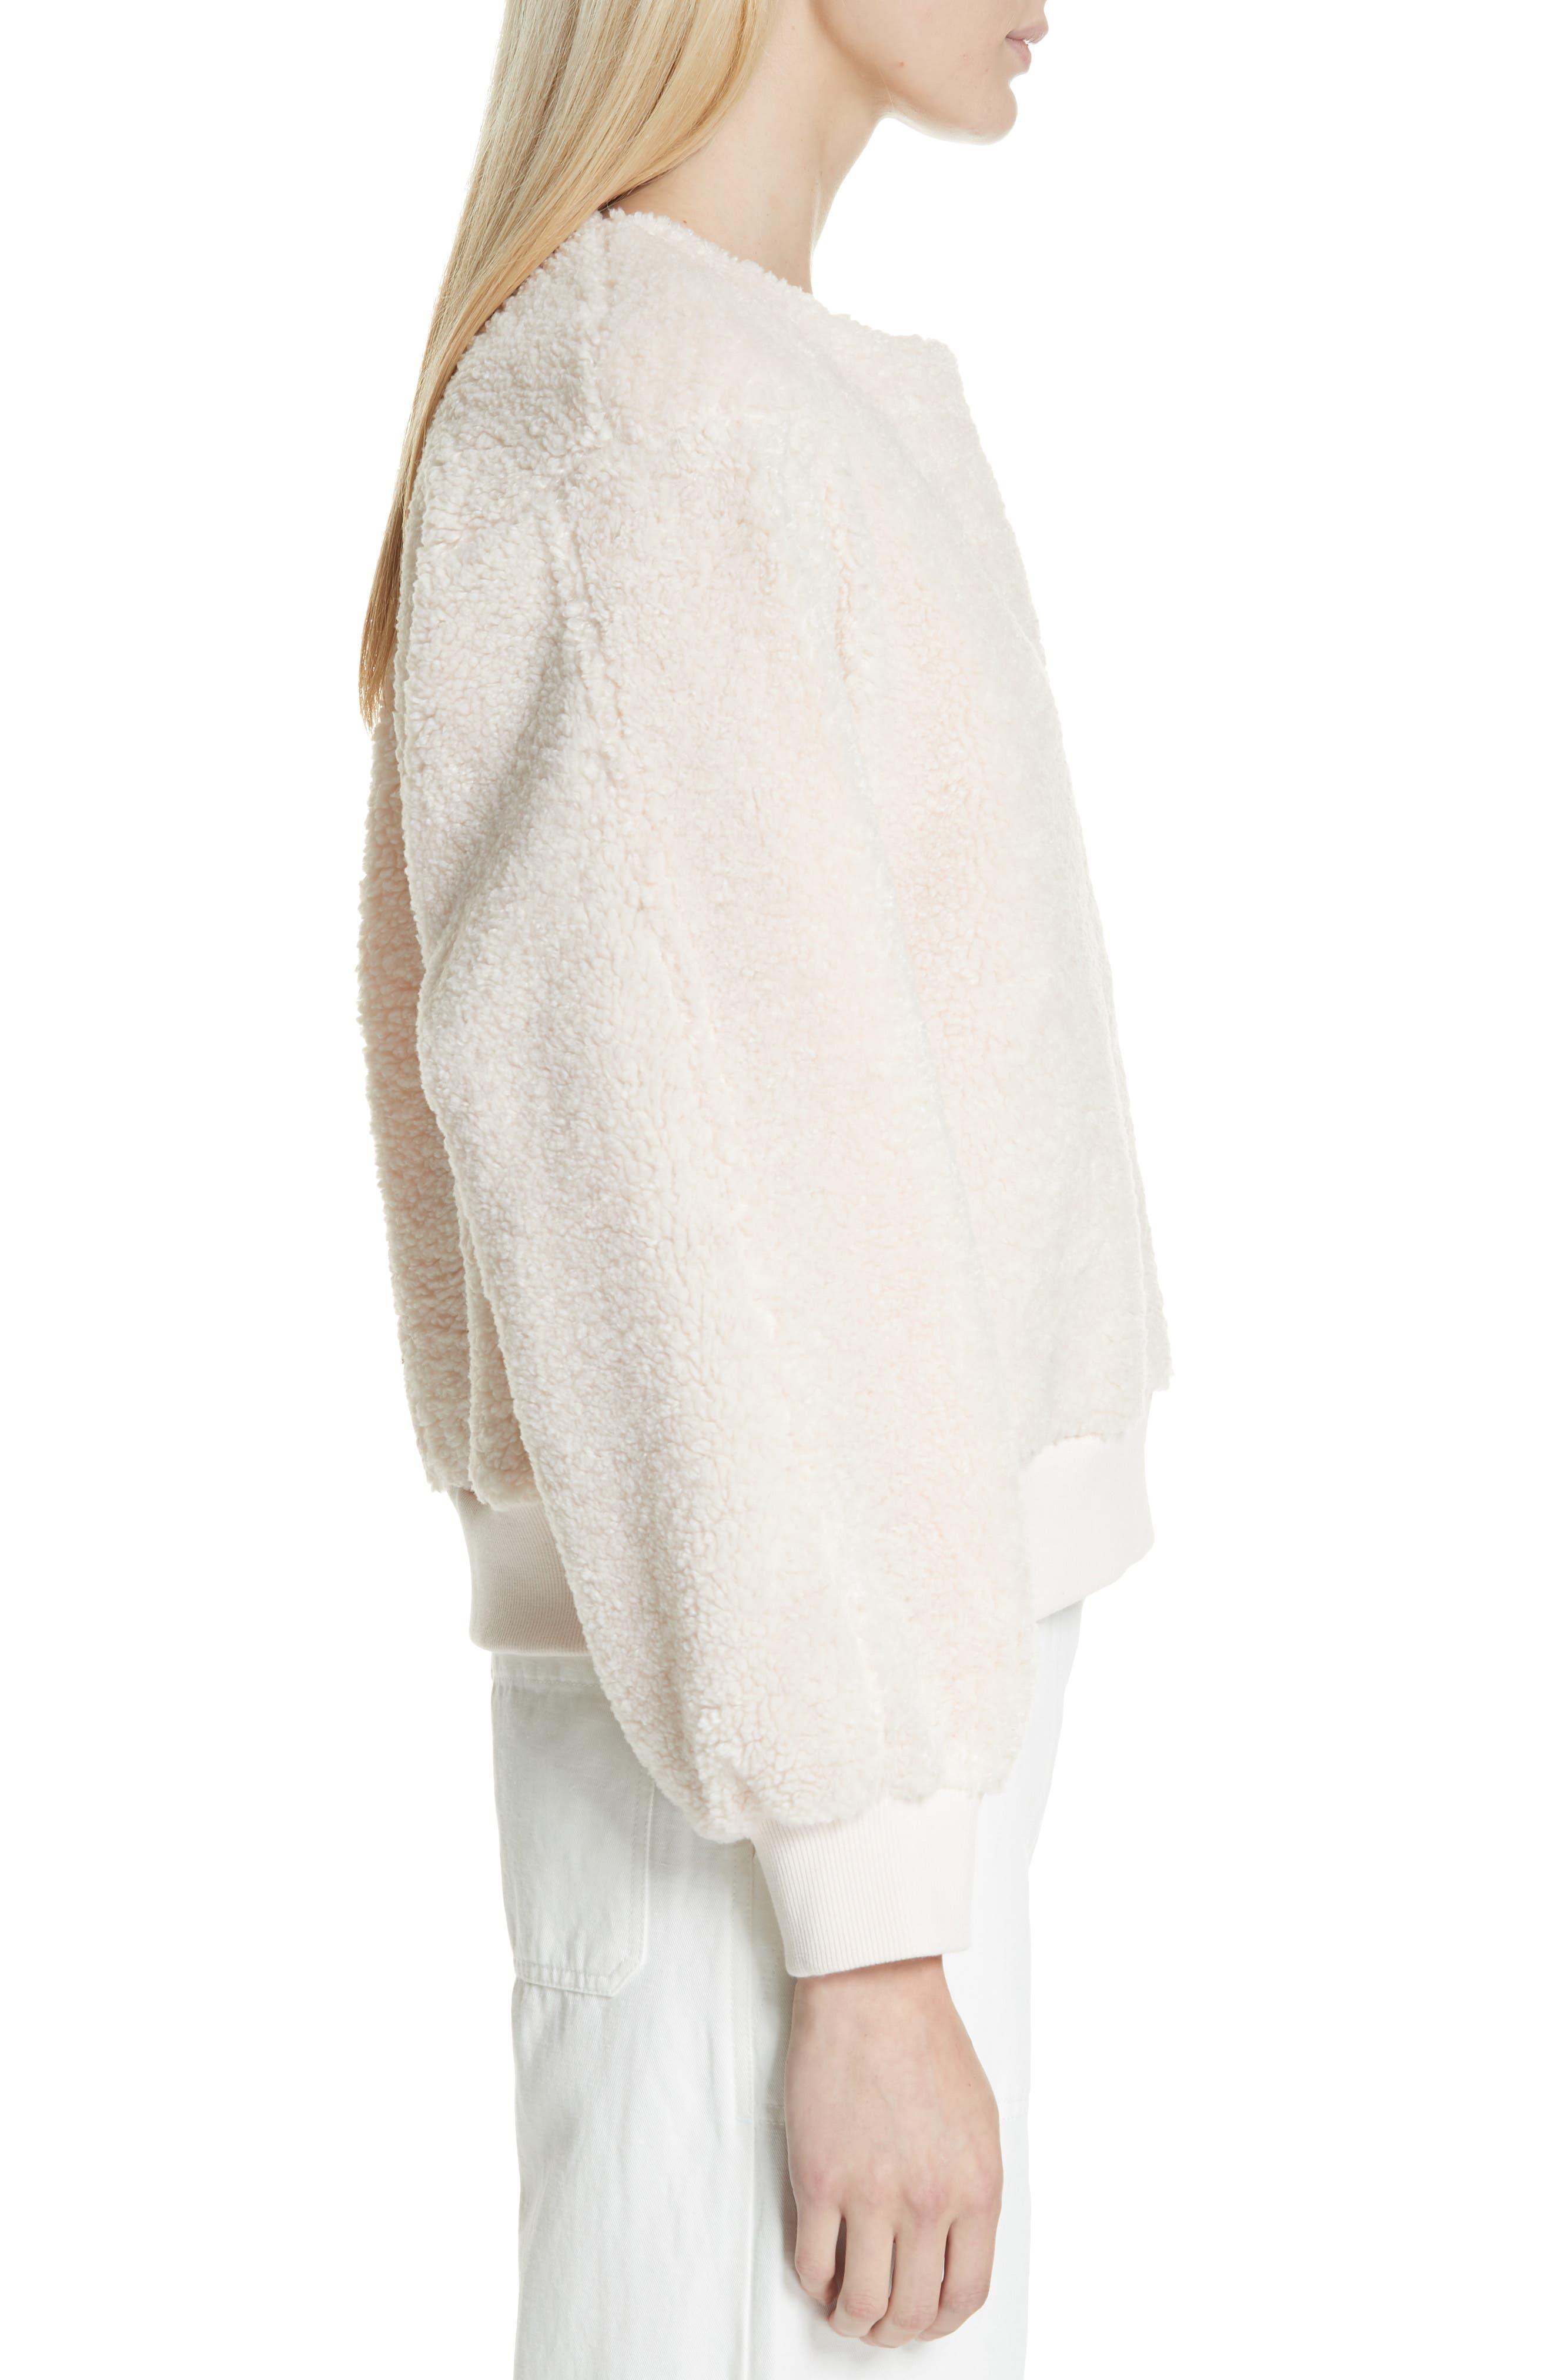 VINCE, Cozy Fleece Pullover, Alternate thumbnail 3, color, SOFT PINK